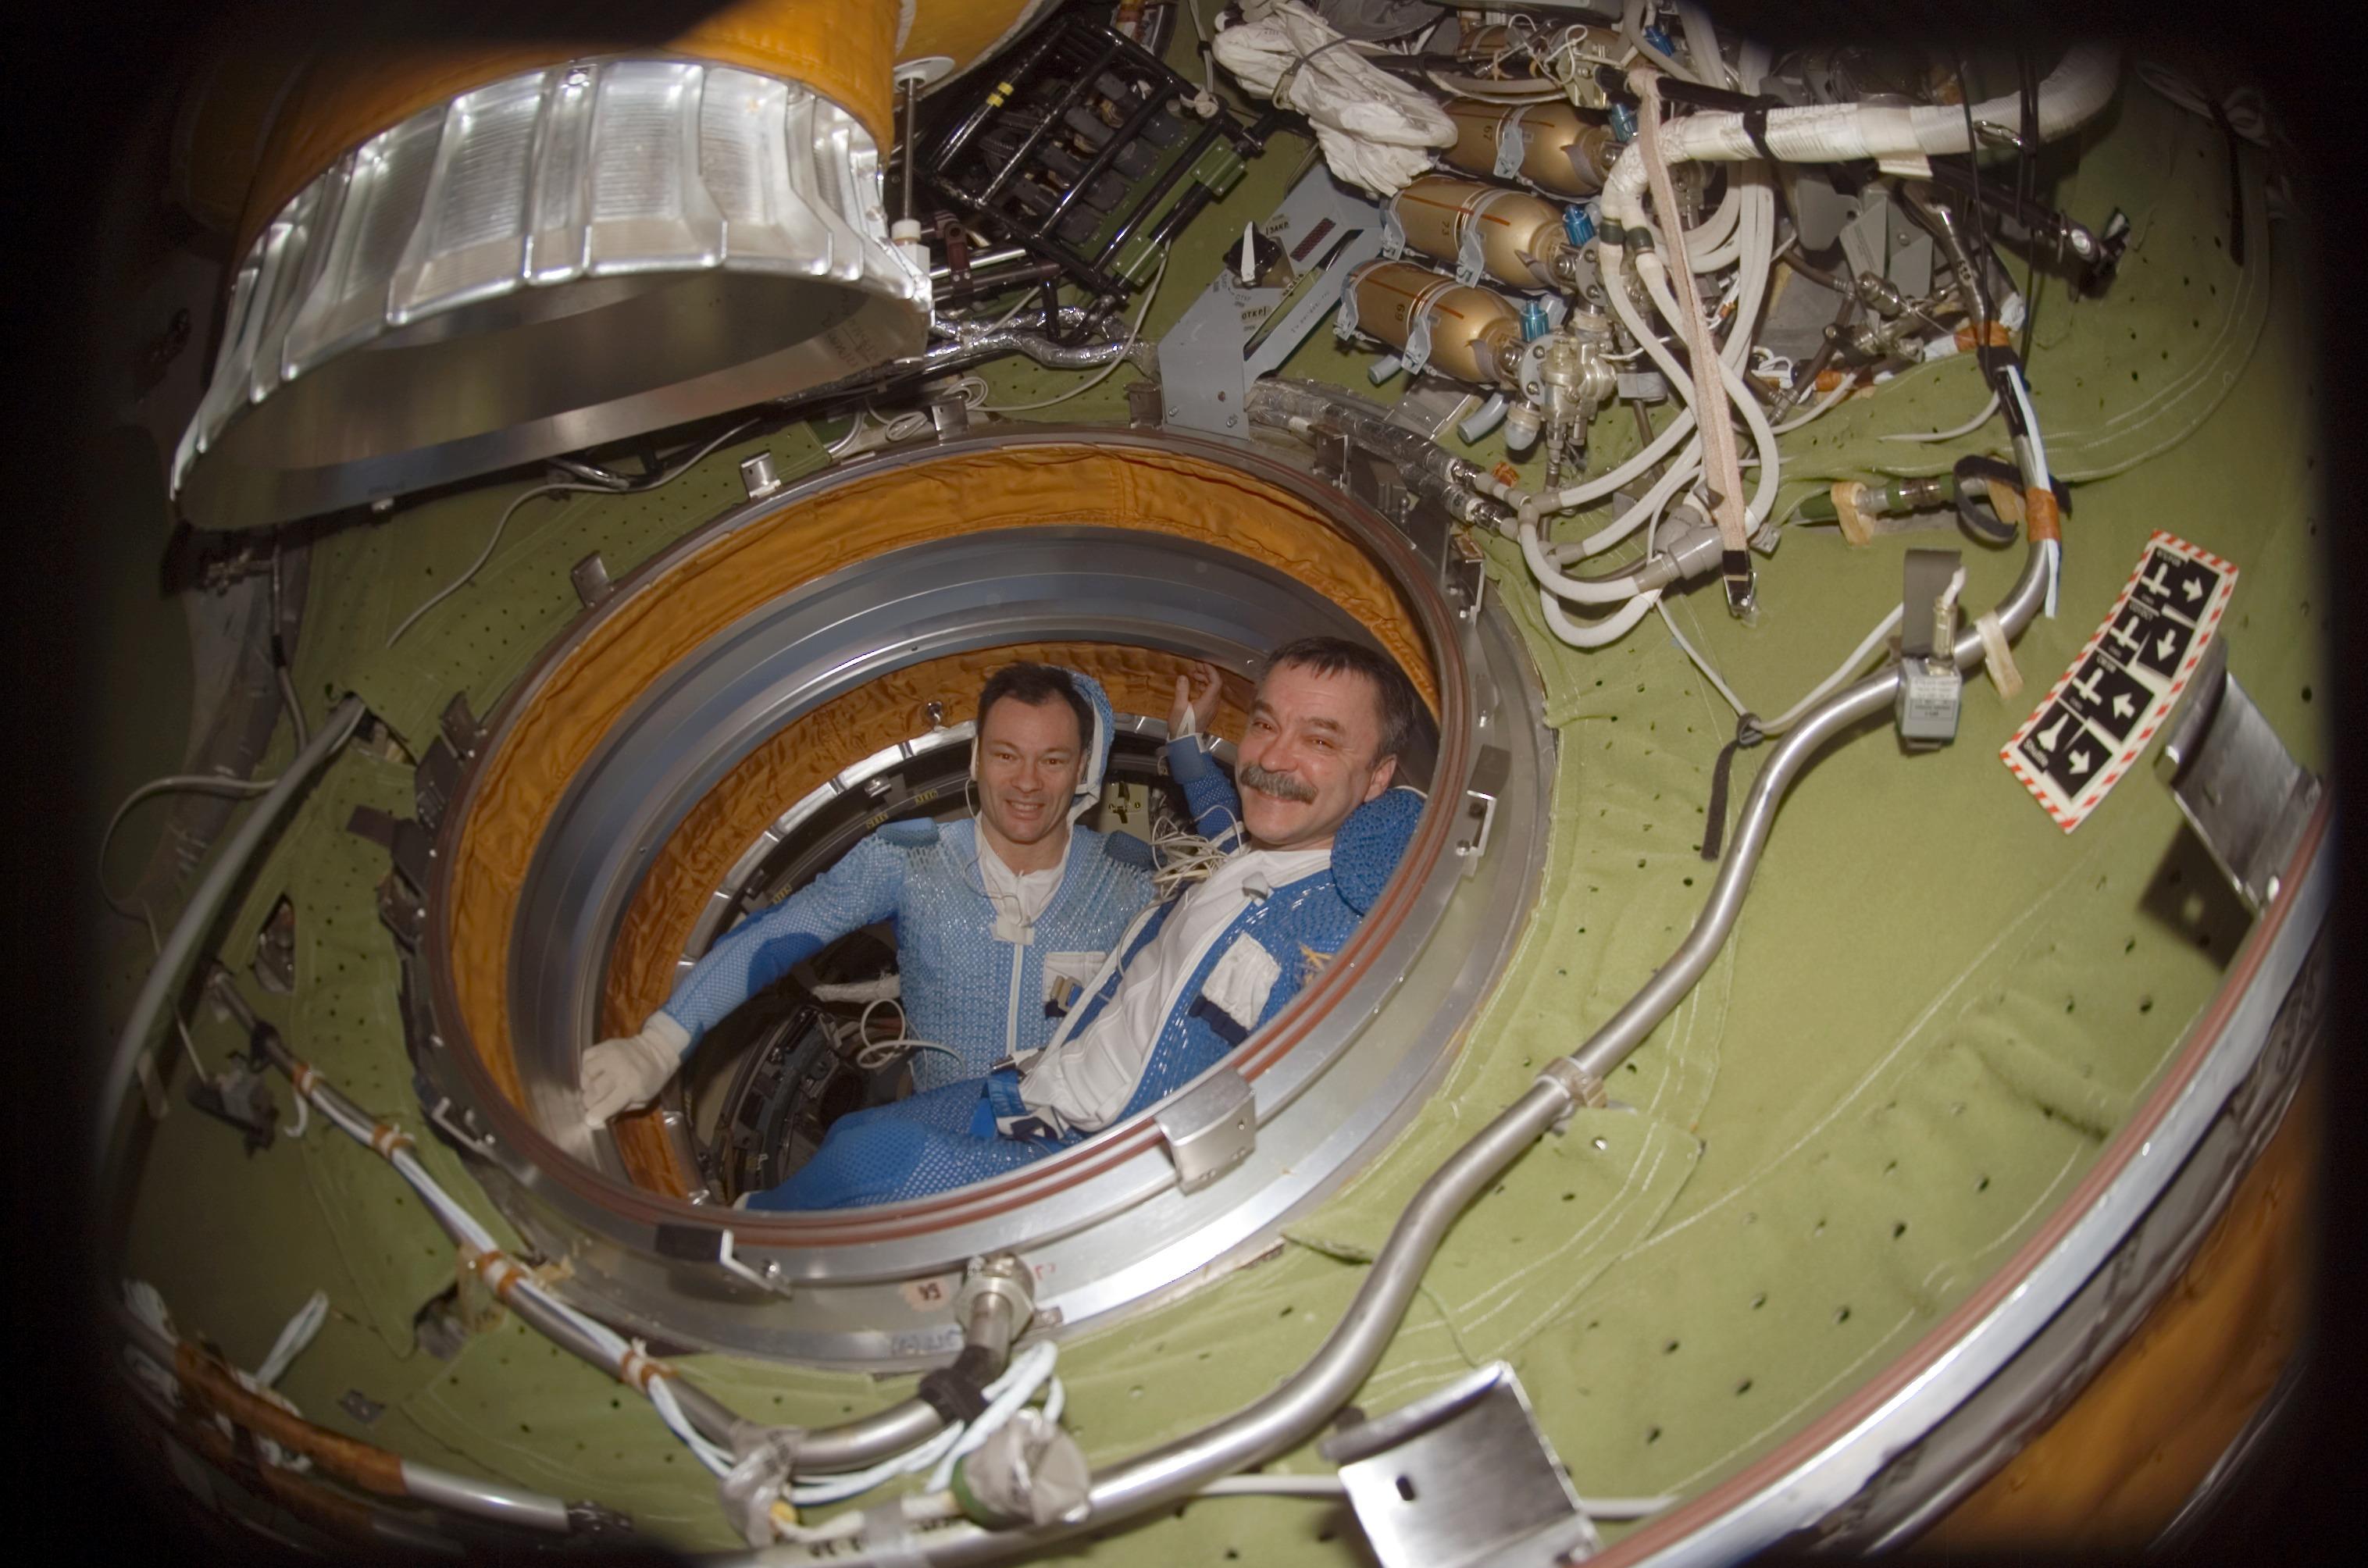 inside space ship docking station - photo #10